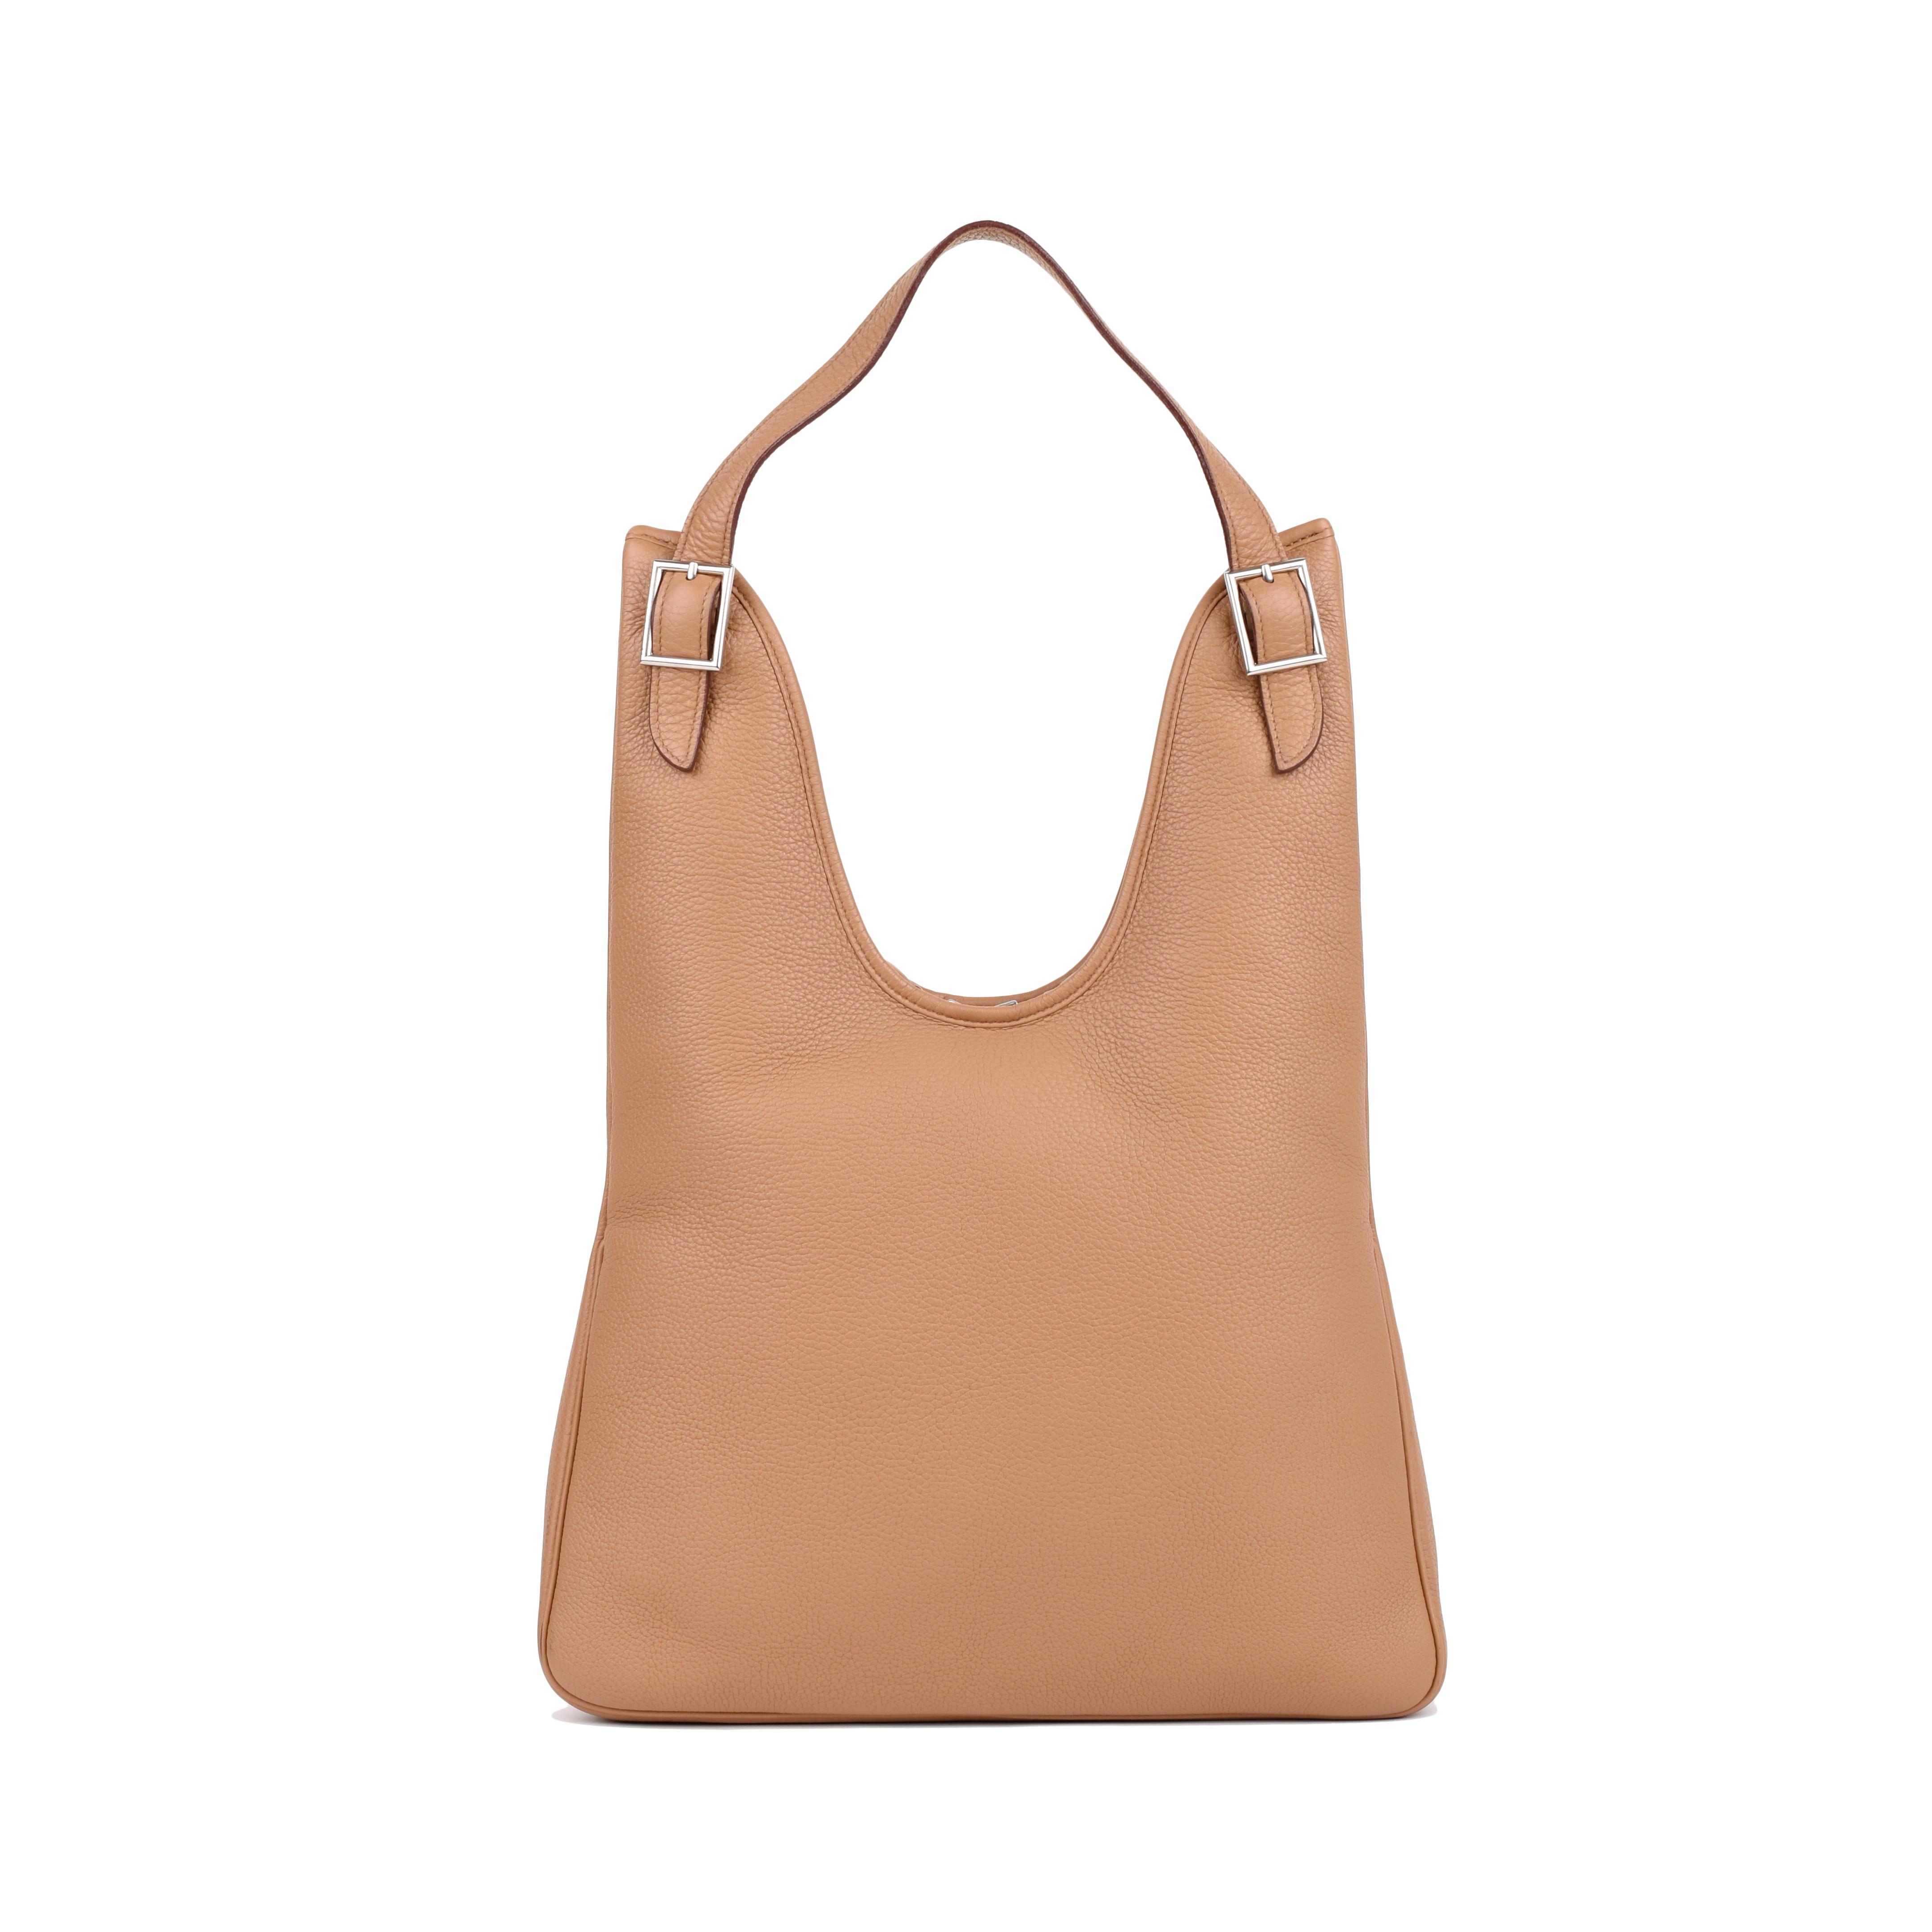 8dfc288f09dd Authentic Second Hand Hermès Massai PM Bag (PSS-462-00042)